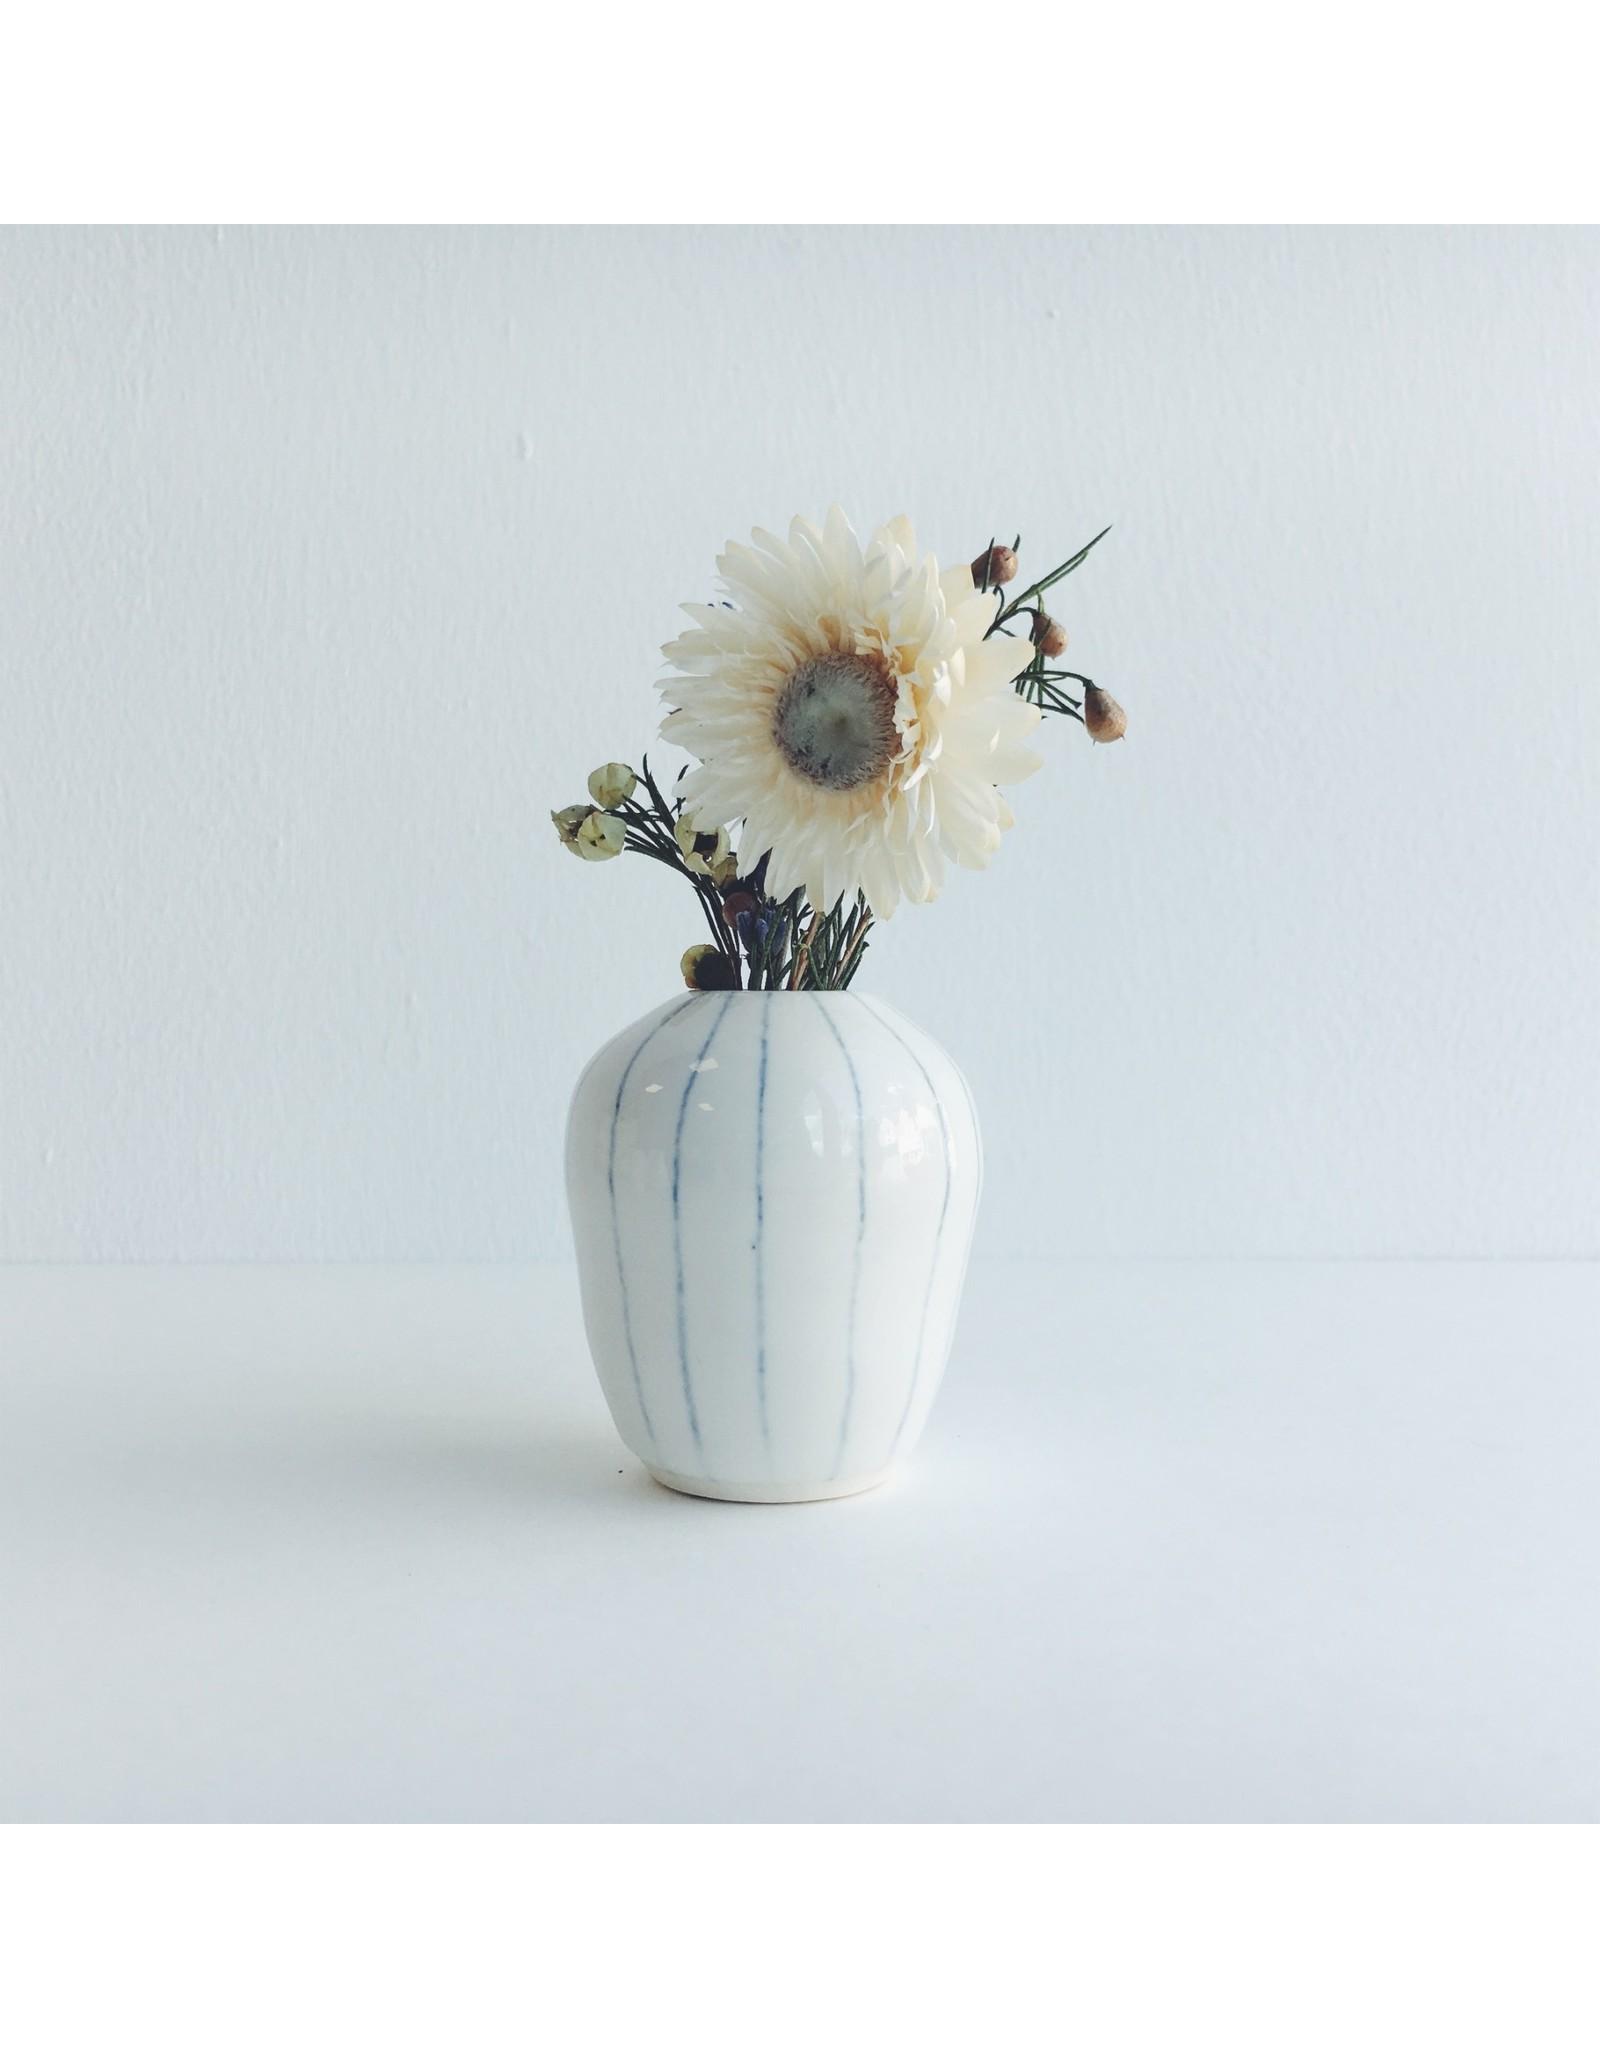 Miniature Porcelain Bud Vase